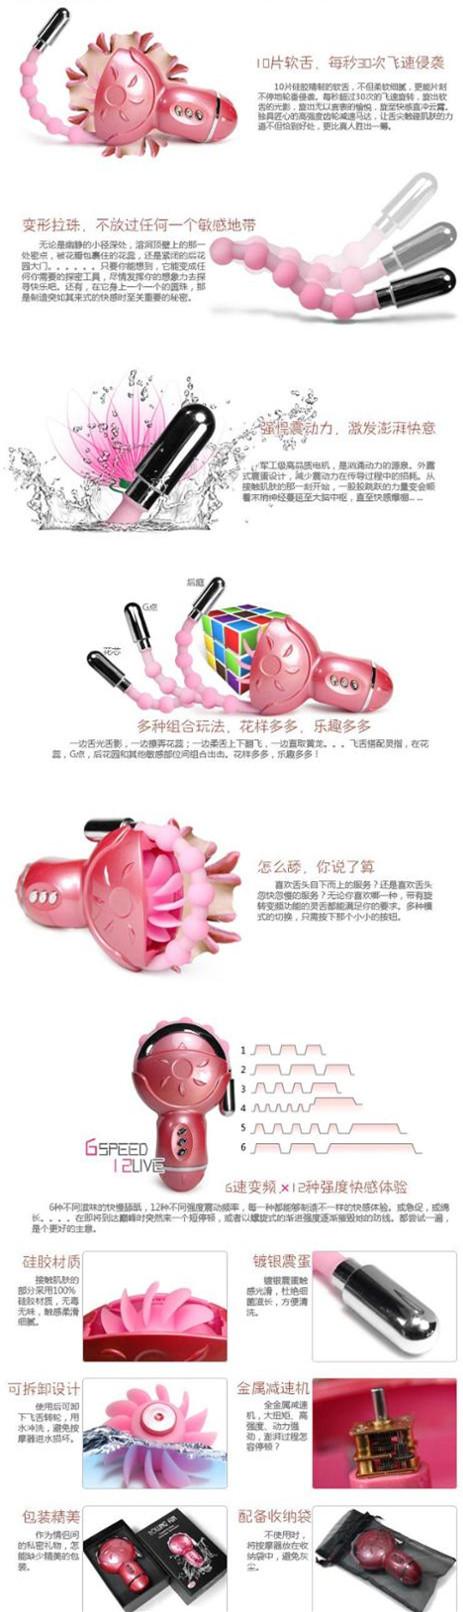 Tongue Sex Toy Oral Sex Sucker,Clitoral Stimulator,G Spot Vibrador Multi-function Vibrator Sex Machine For Woman 1